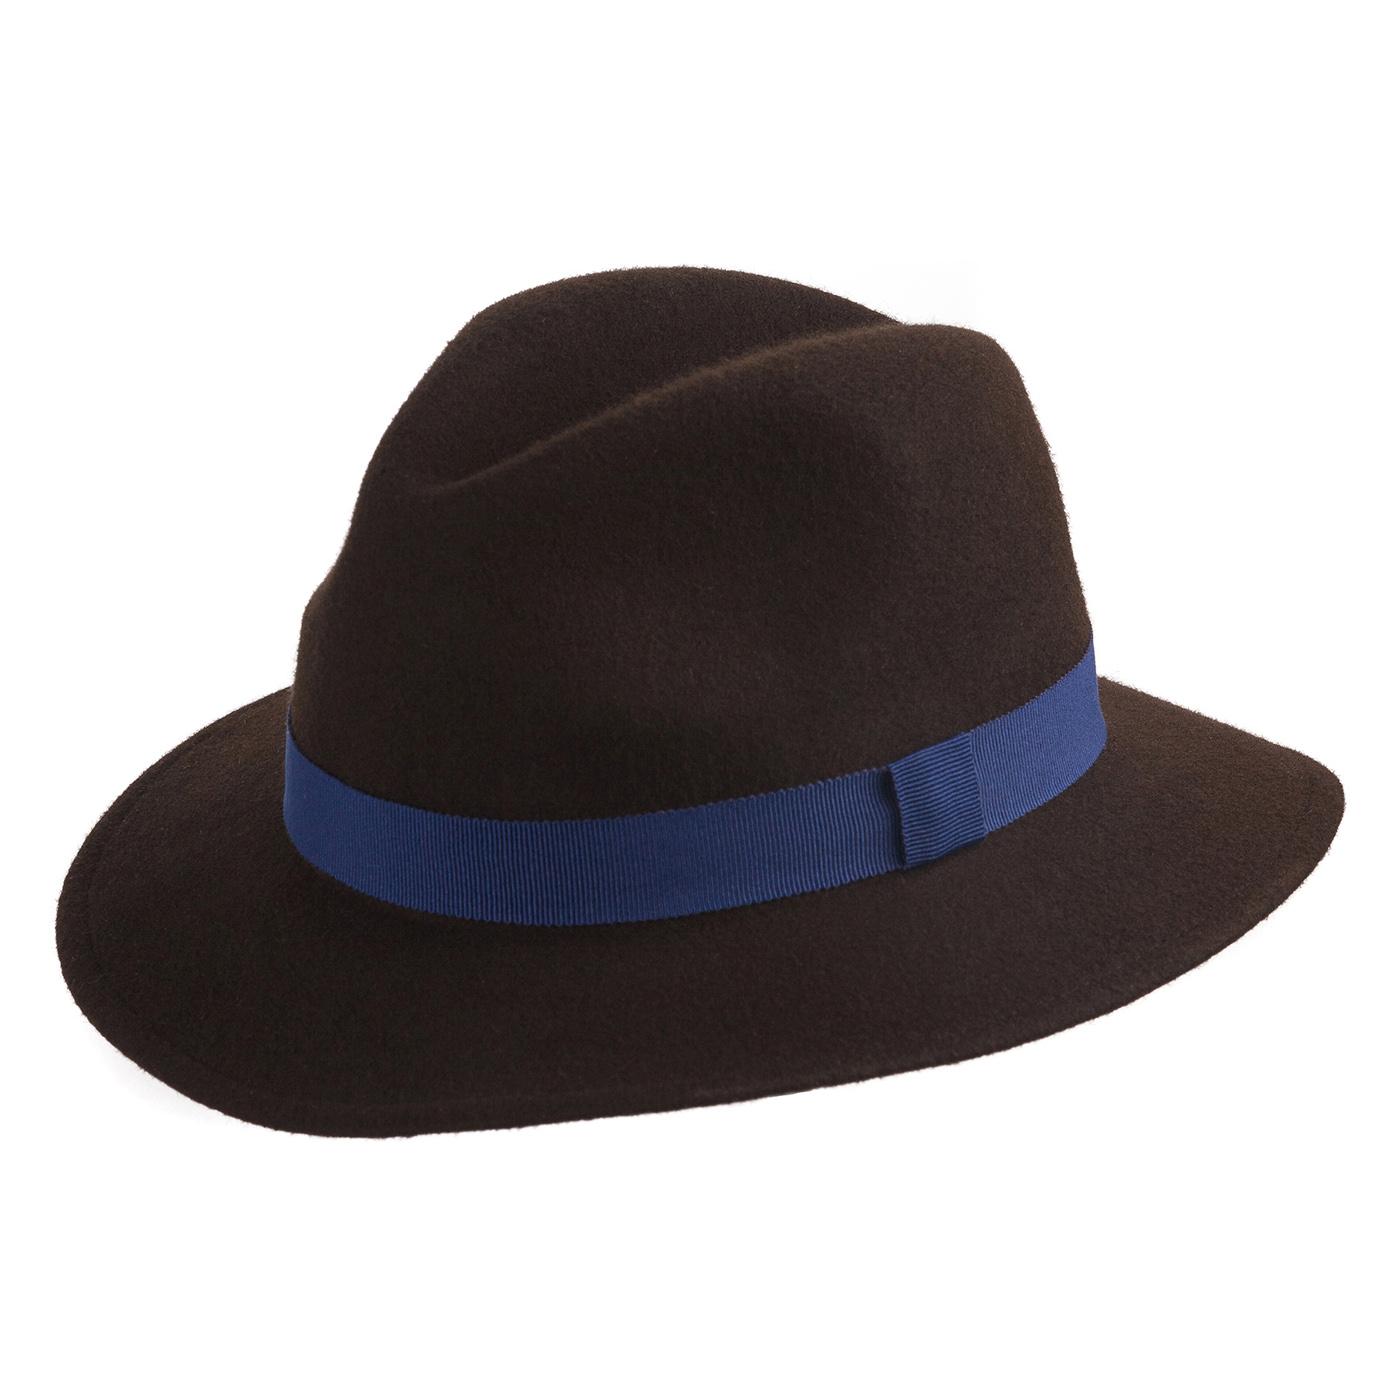 Faustmann Woll Traveller dunkelblau Outdoor Hut wasserabweisend